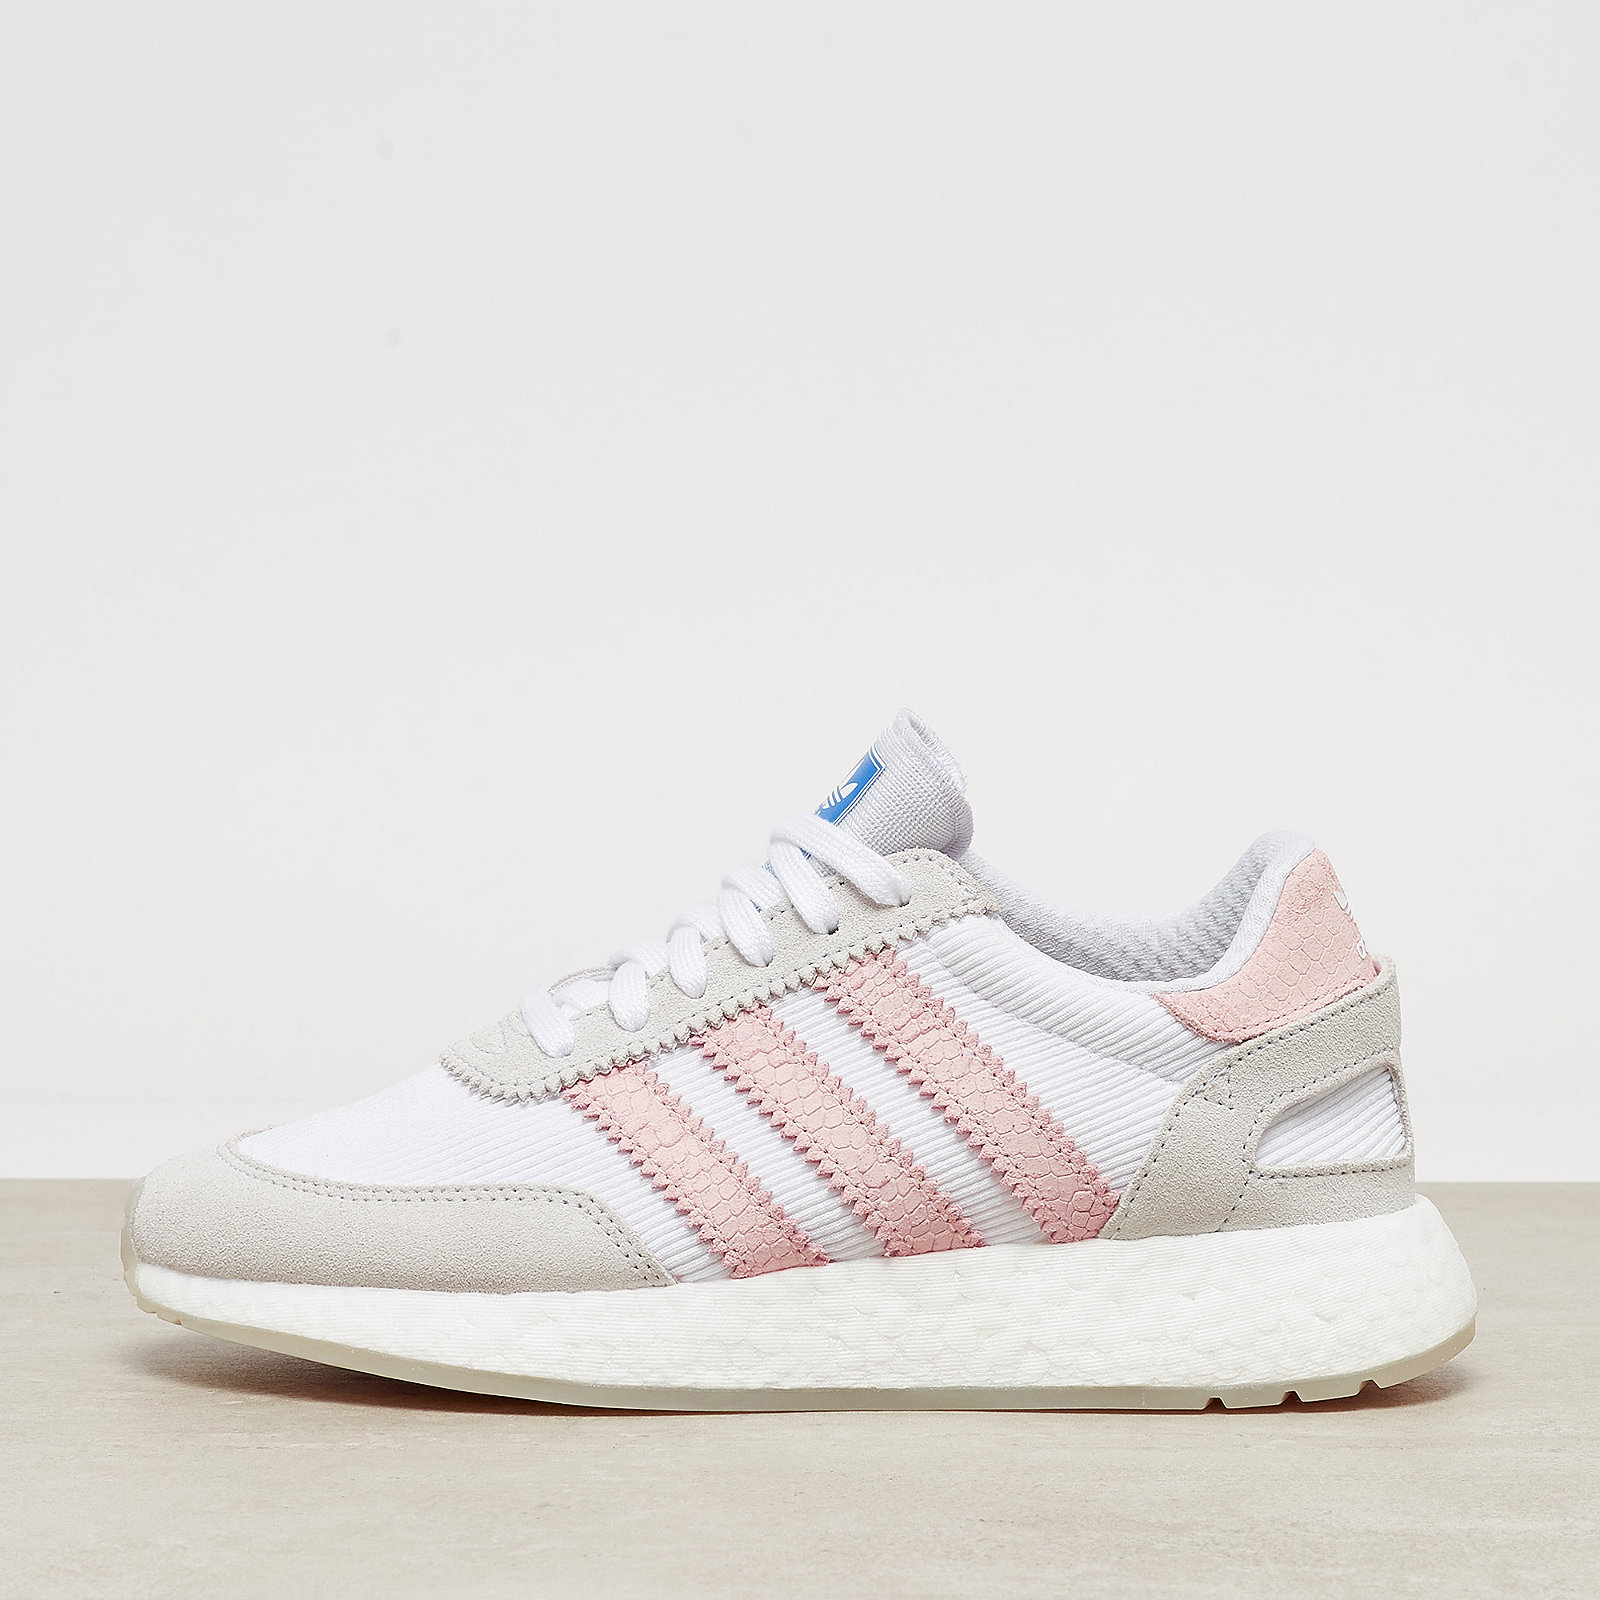 ADIDAS adidas I-5923 white/icey pink/crystal white